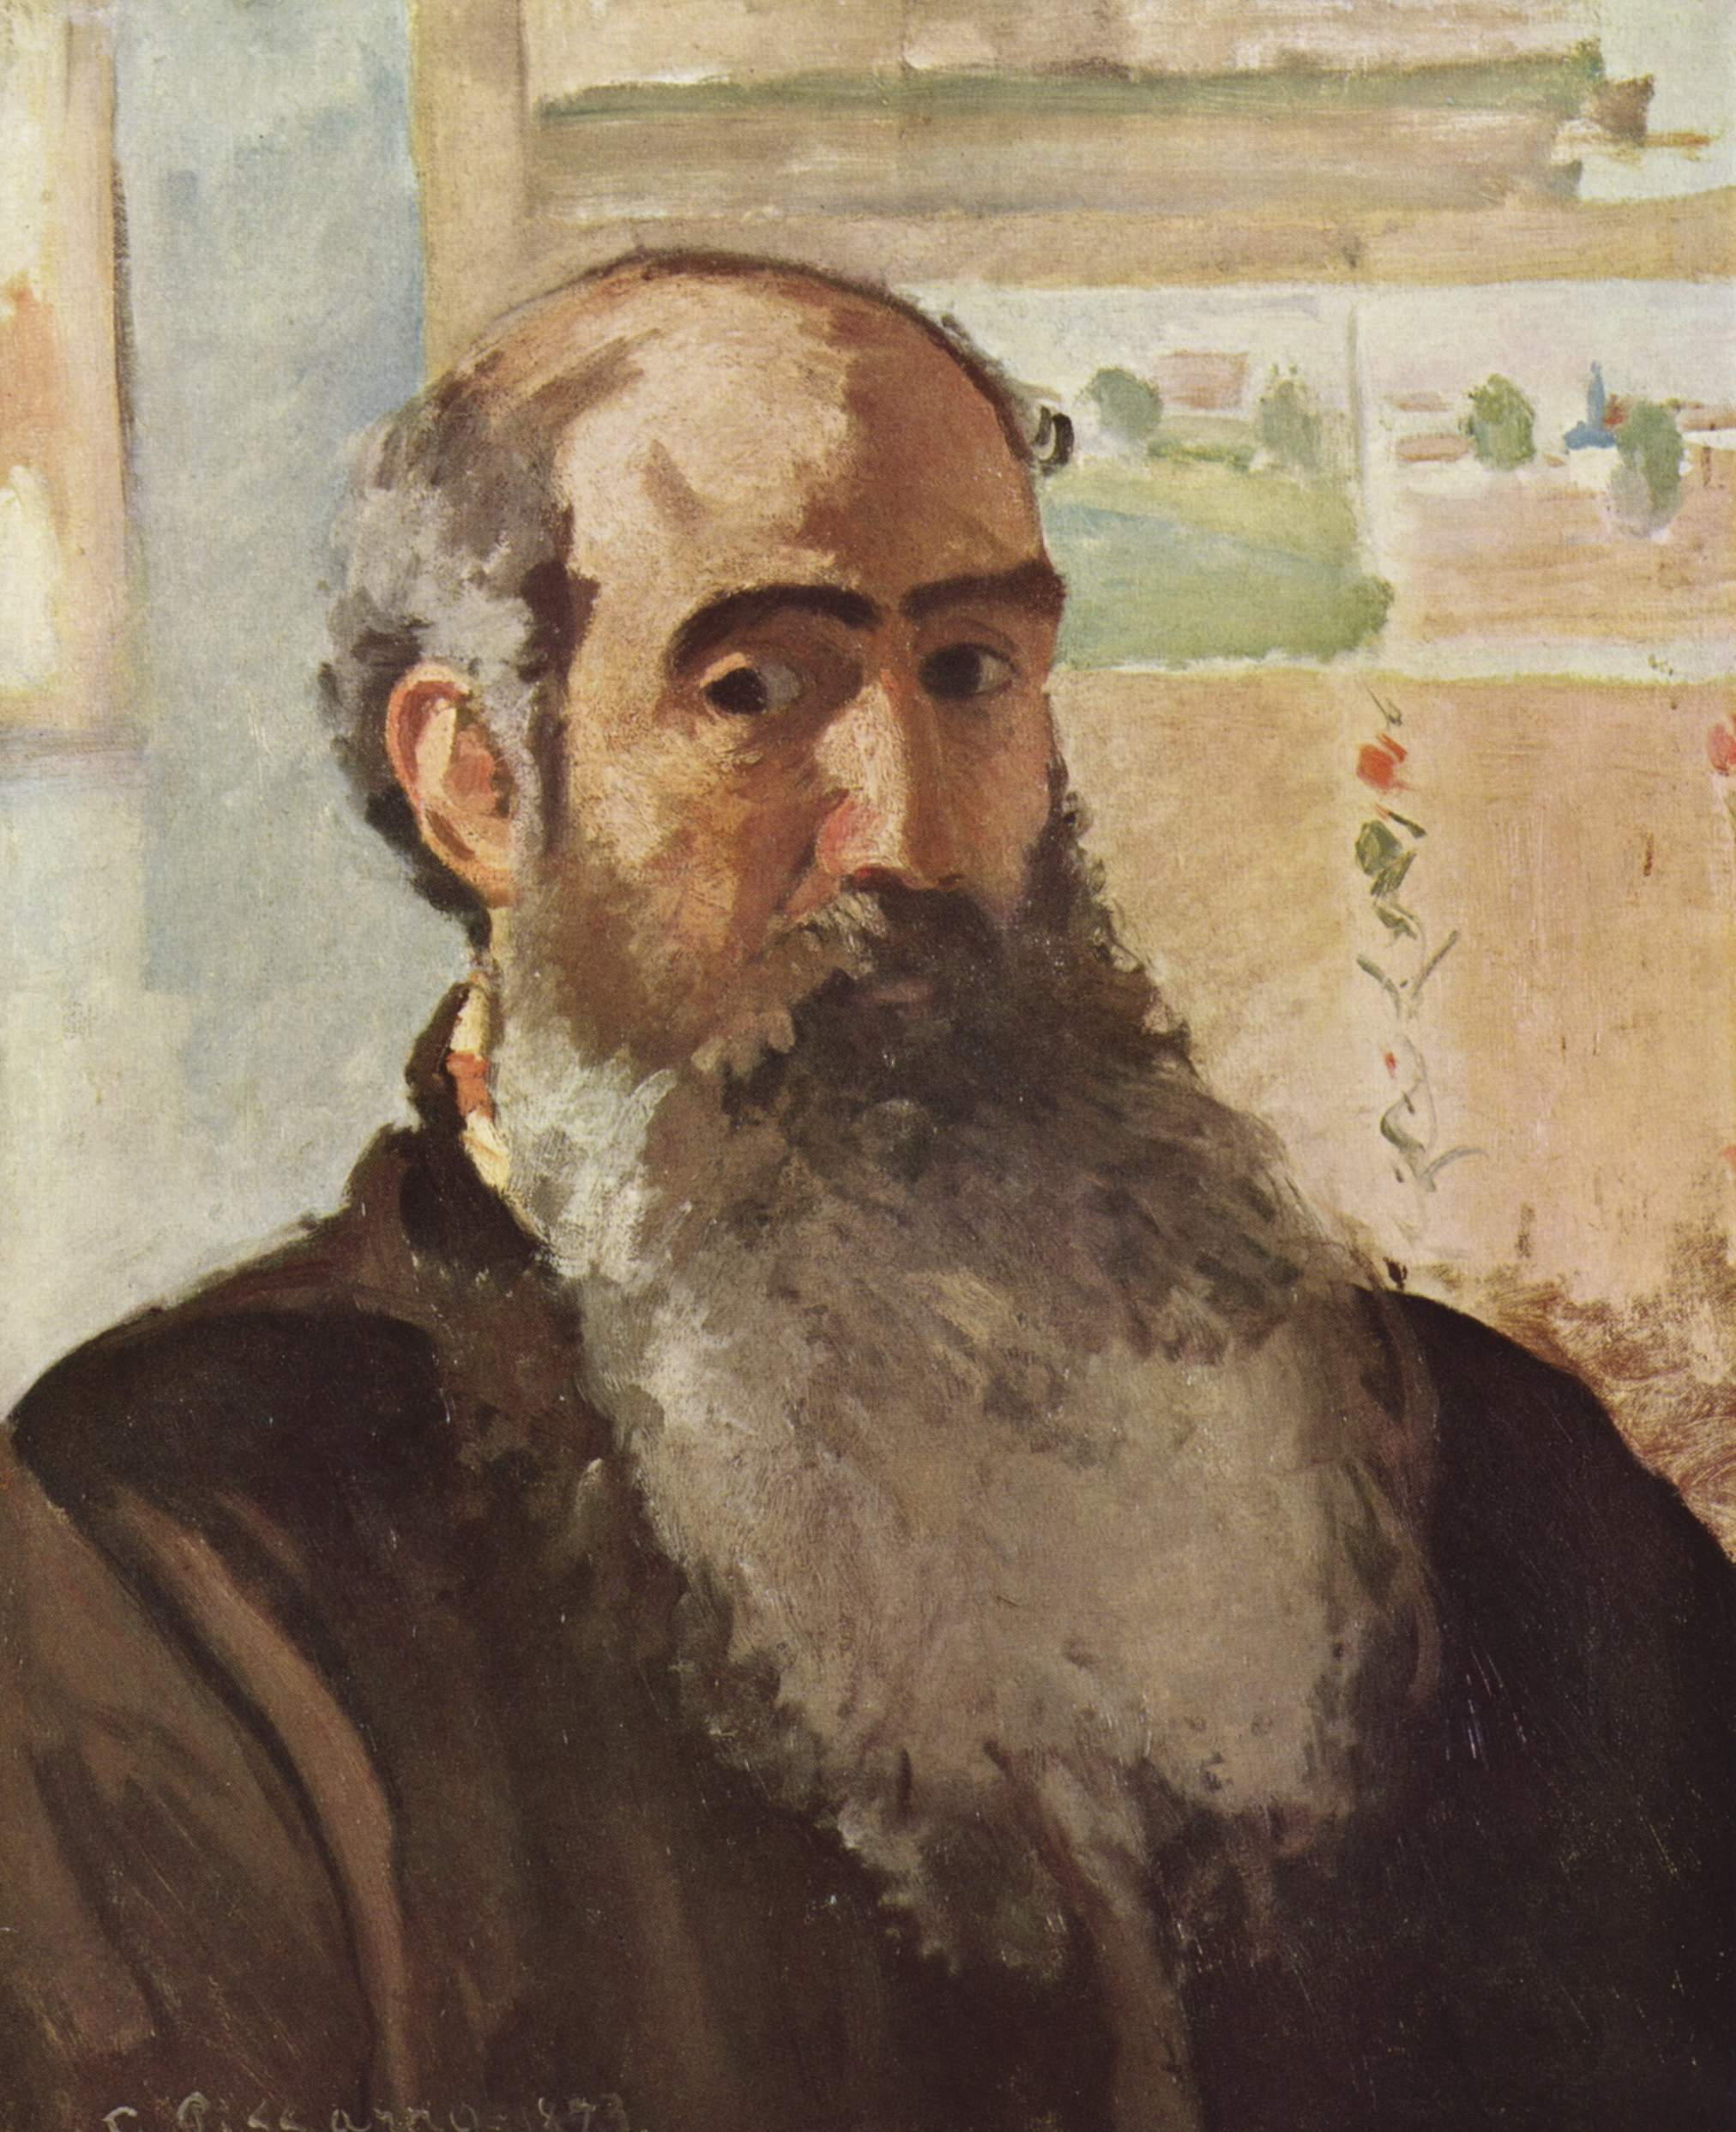 Cote Artiste Peintre Francais camille pissarro — wikipédia